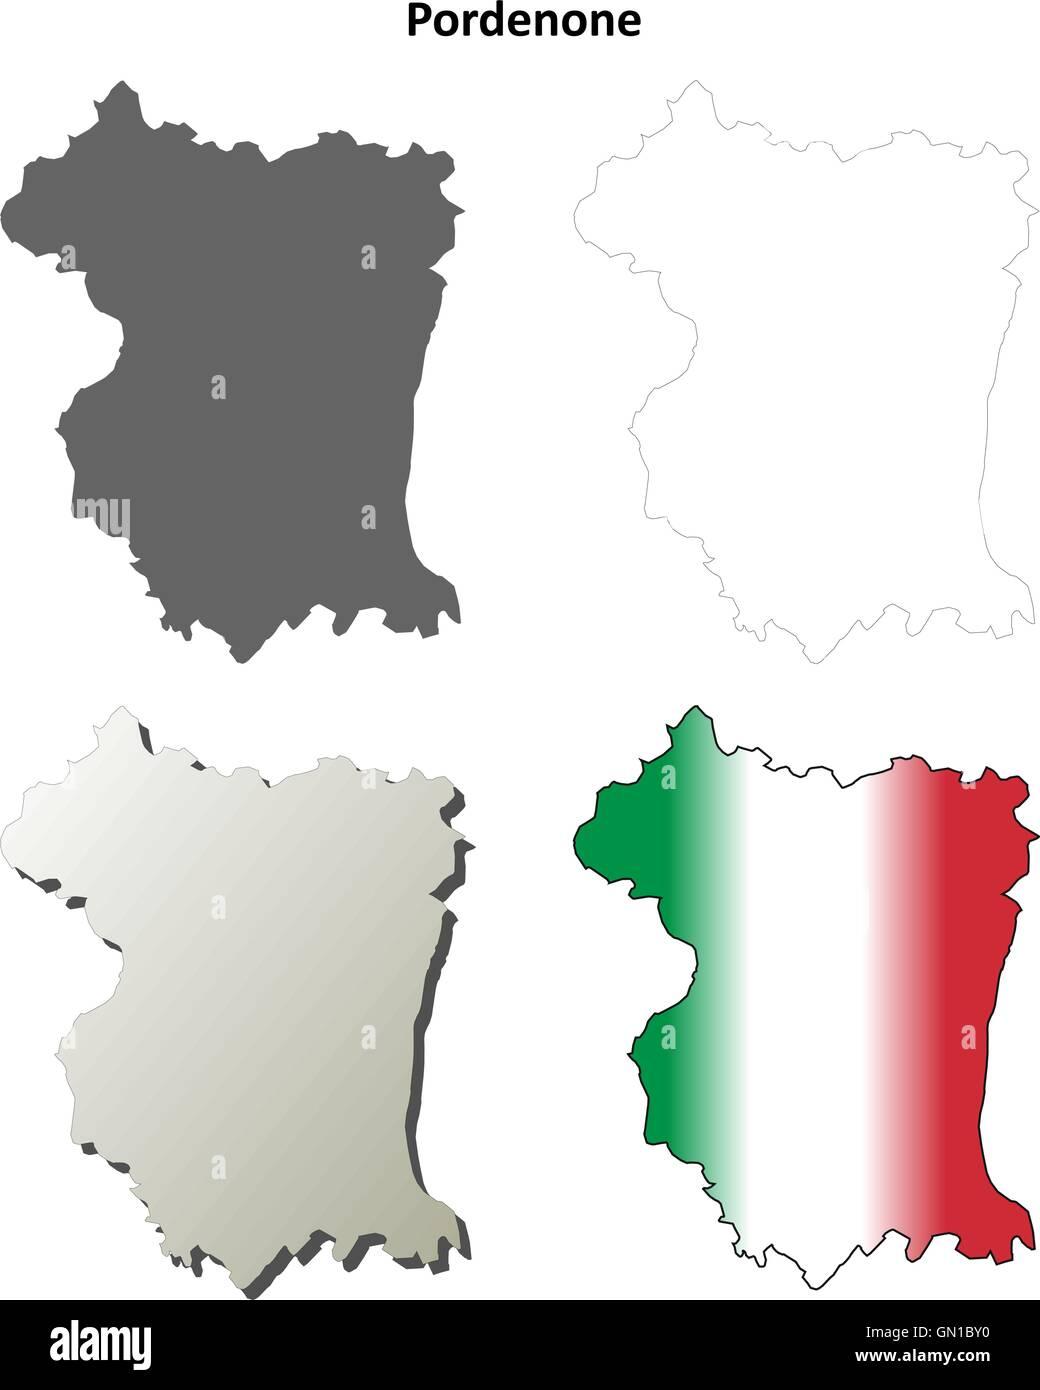 Pordenone Italy Stock Vector Images Alamy